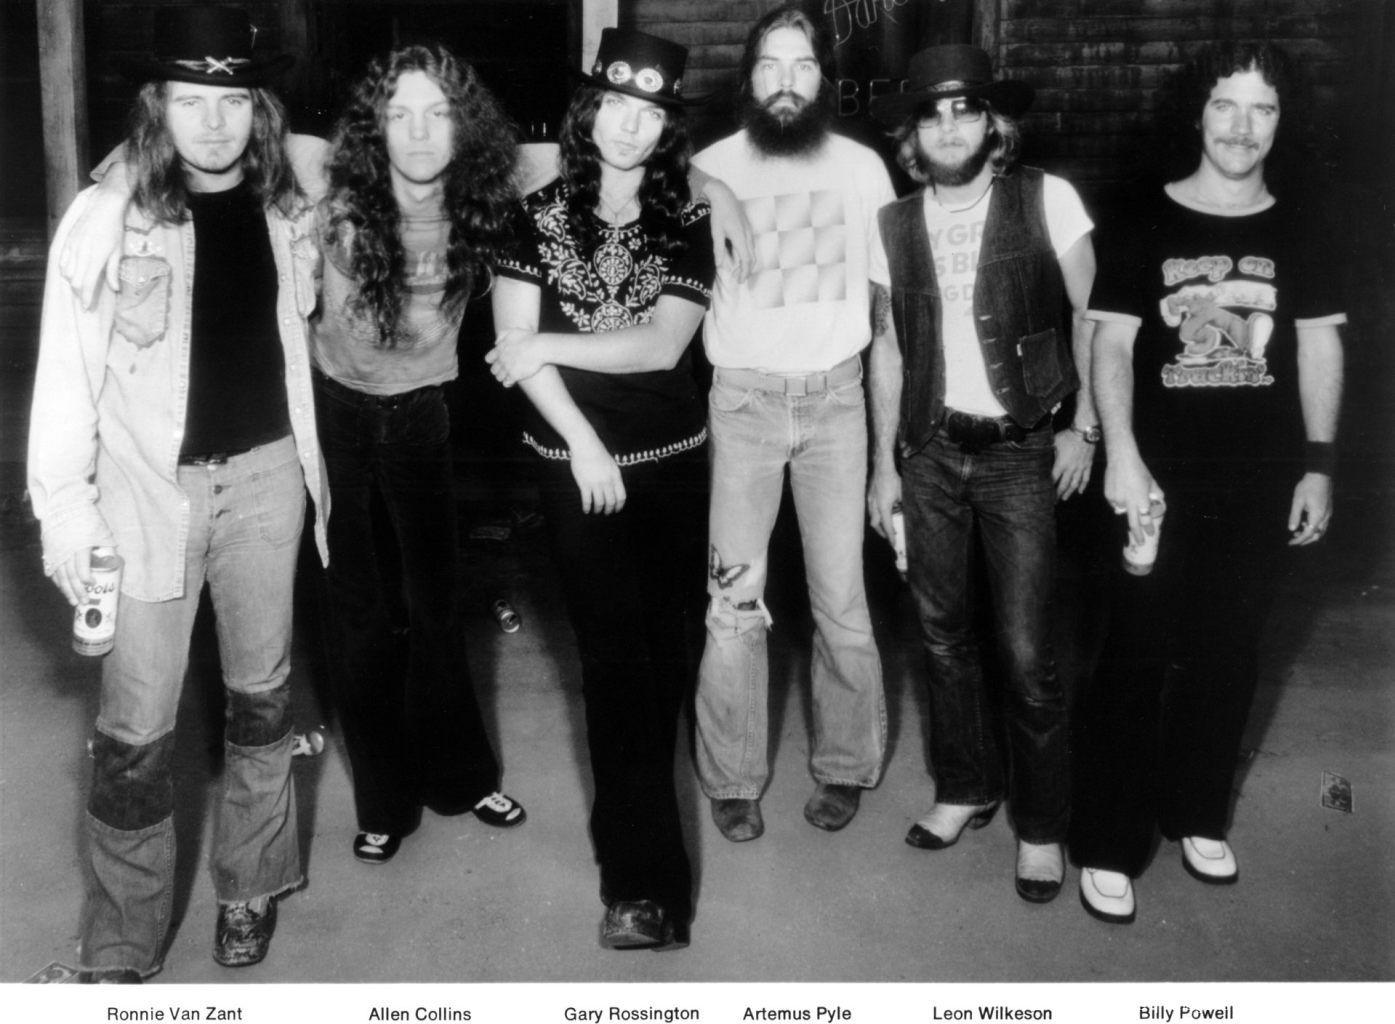 1976: Lynyrd Skynyrd (L-R Ronnie Van Zandt, Allen Collins, Gary Rossington, Artimus Pyle, Leon Wilkeson and Billy Powell) pose for a portrait in 1976.